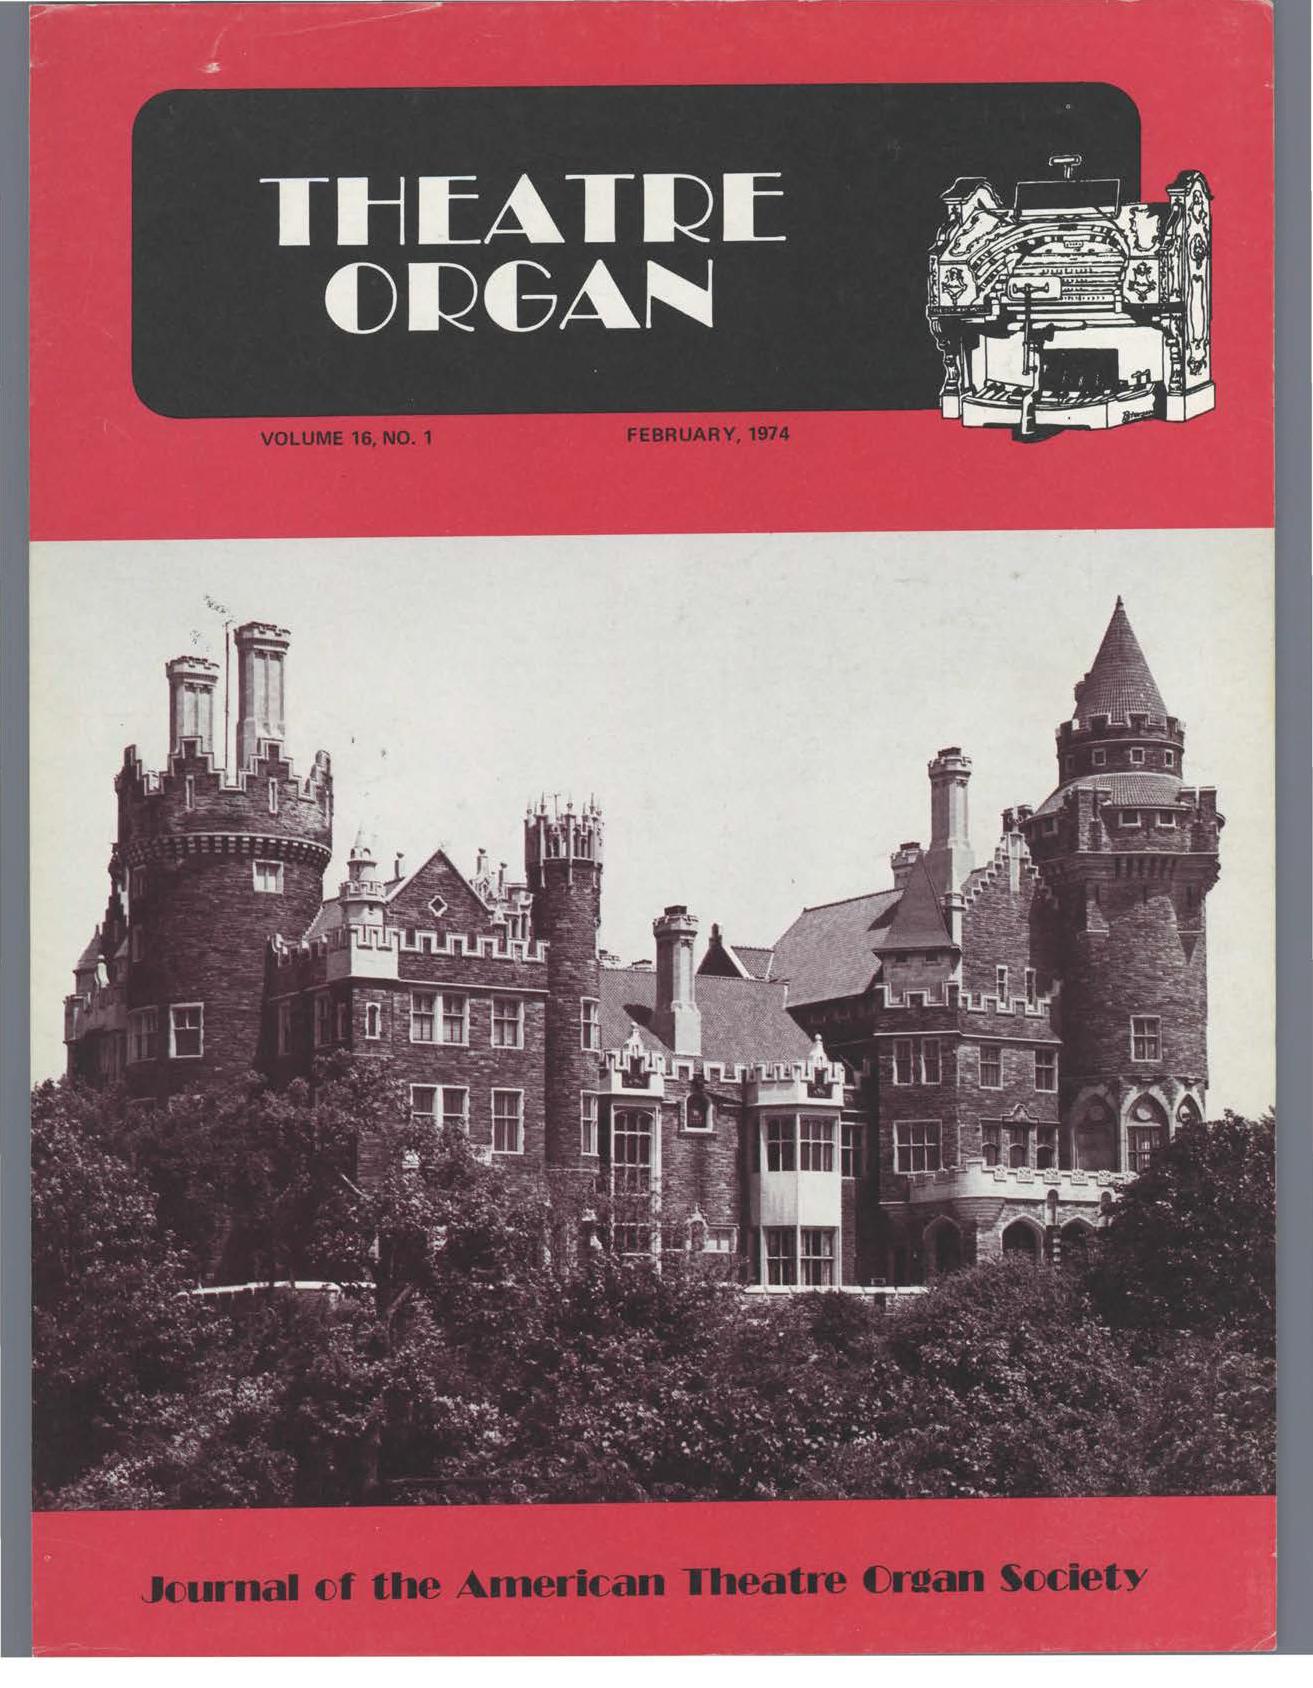 Theatre Organ, February 1974, Volume 16, Number 1